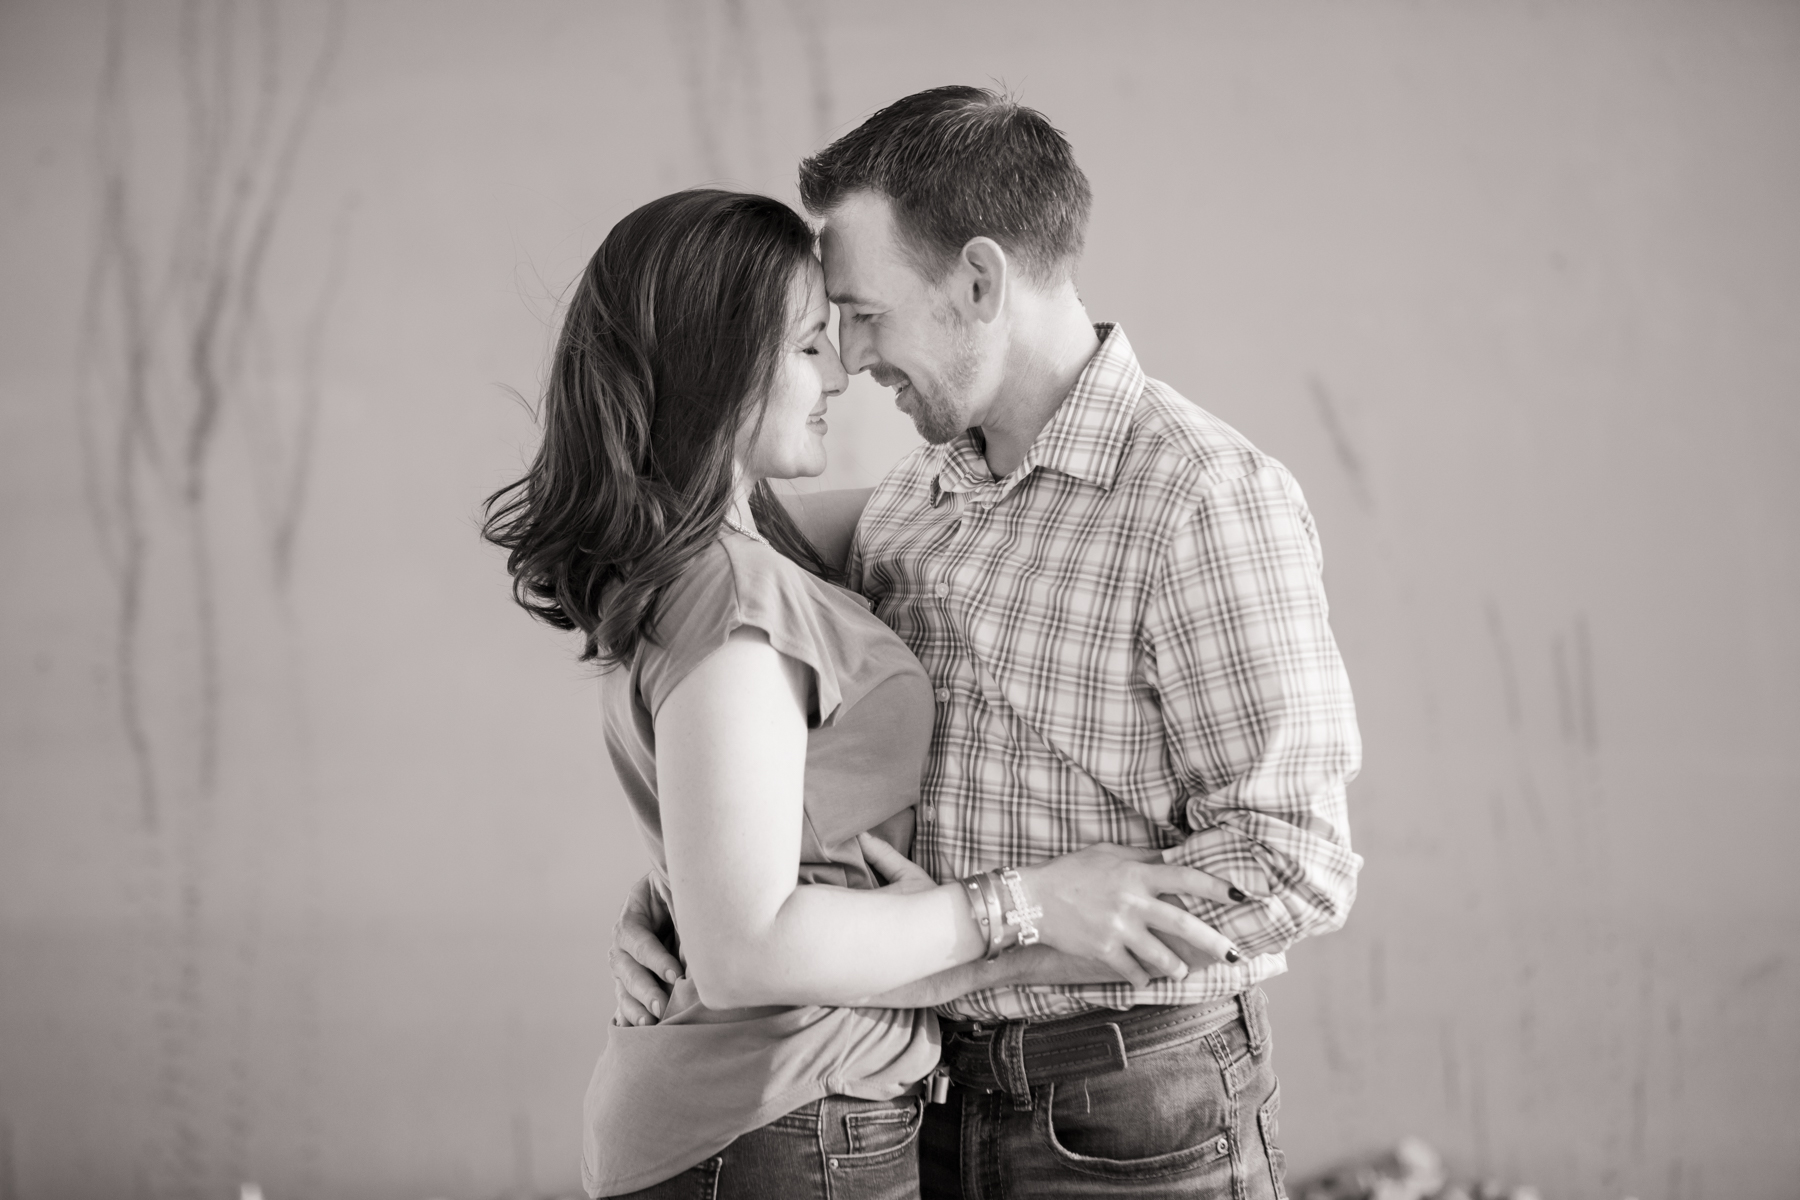 Jackie-and-Matt-Engagement-Negatives-0087.jpg